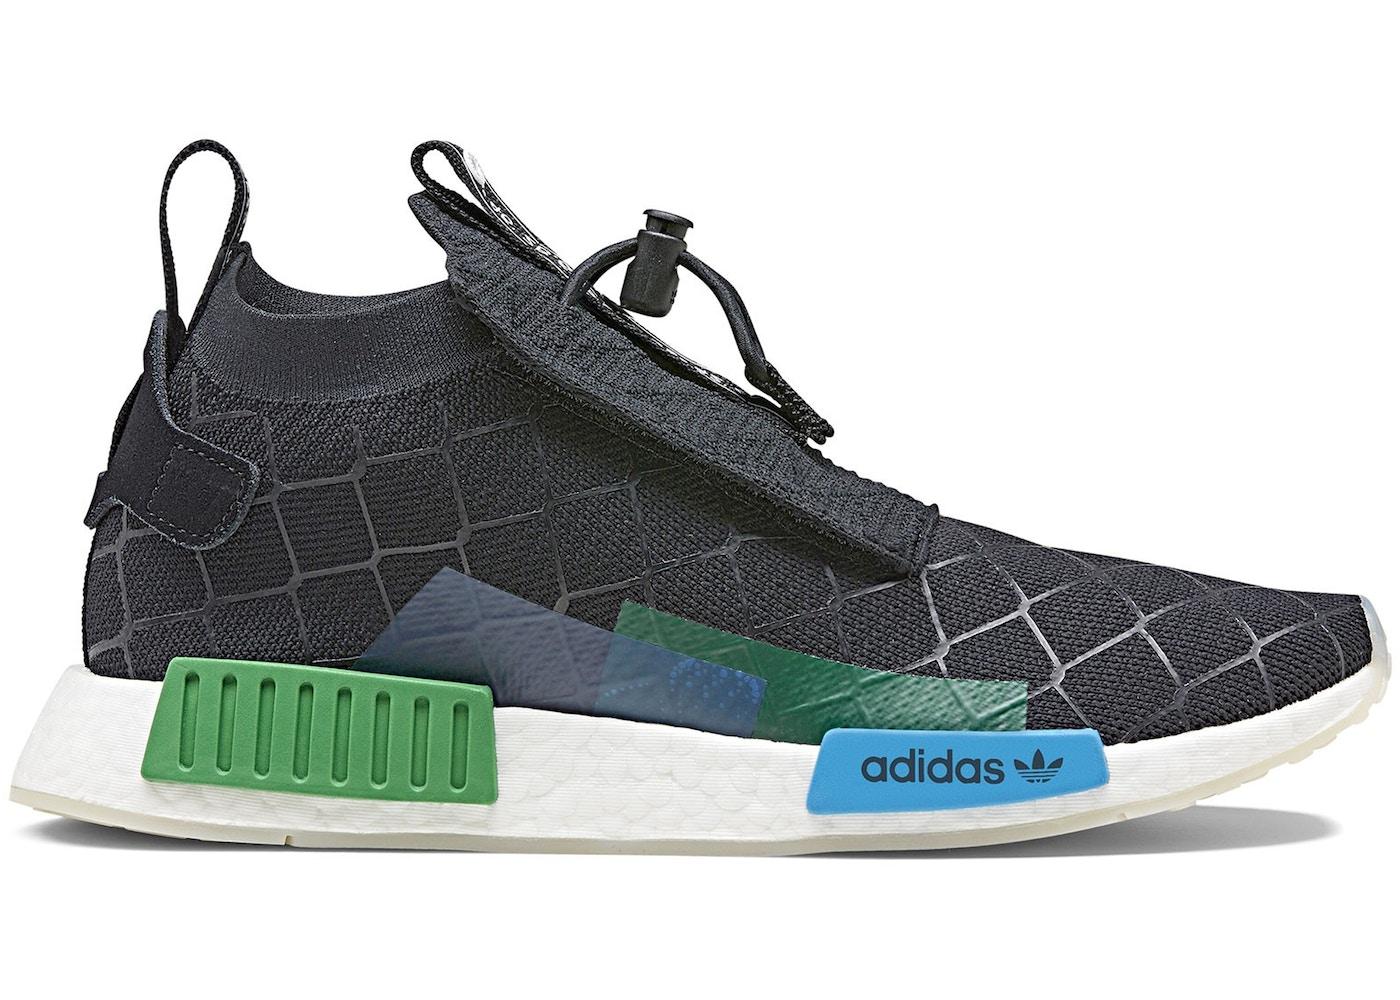 adidas nmd ts1 gore tex core black primeknit mita cages and